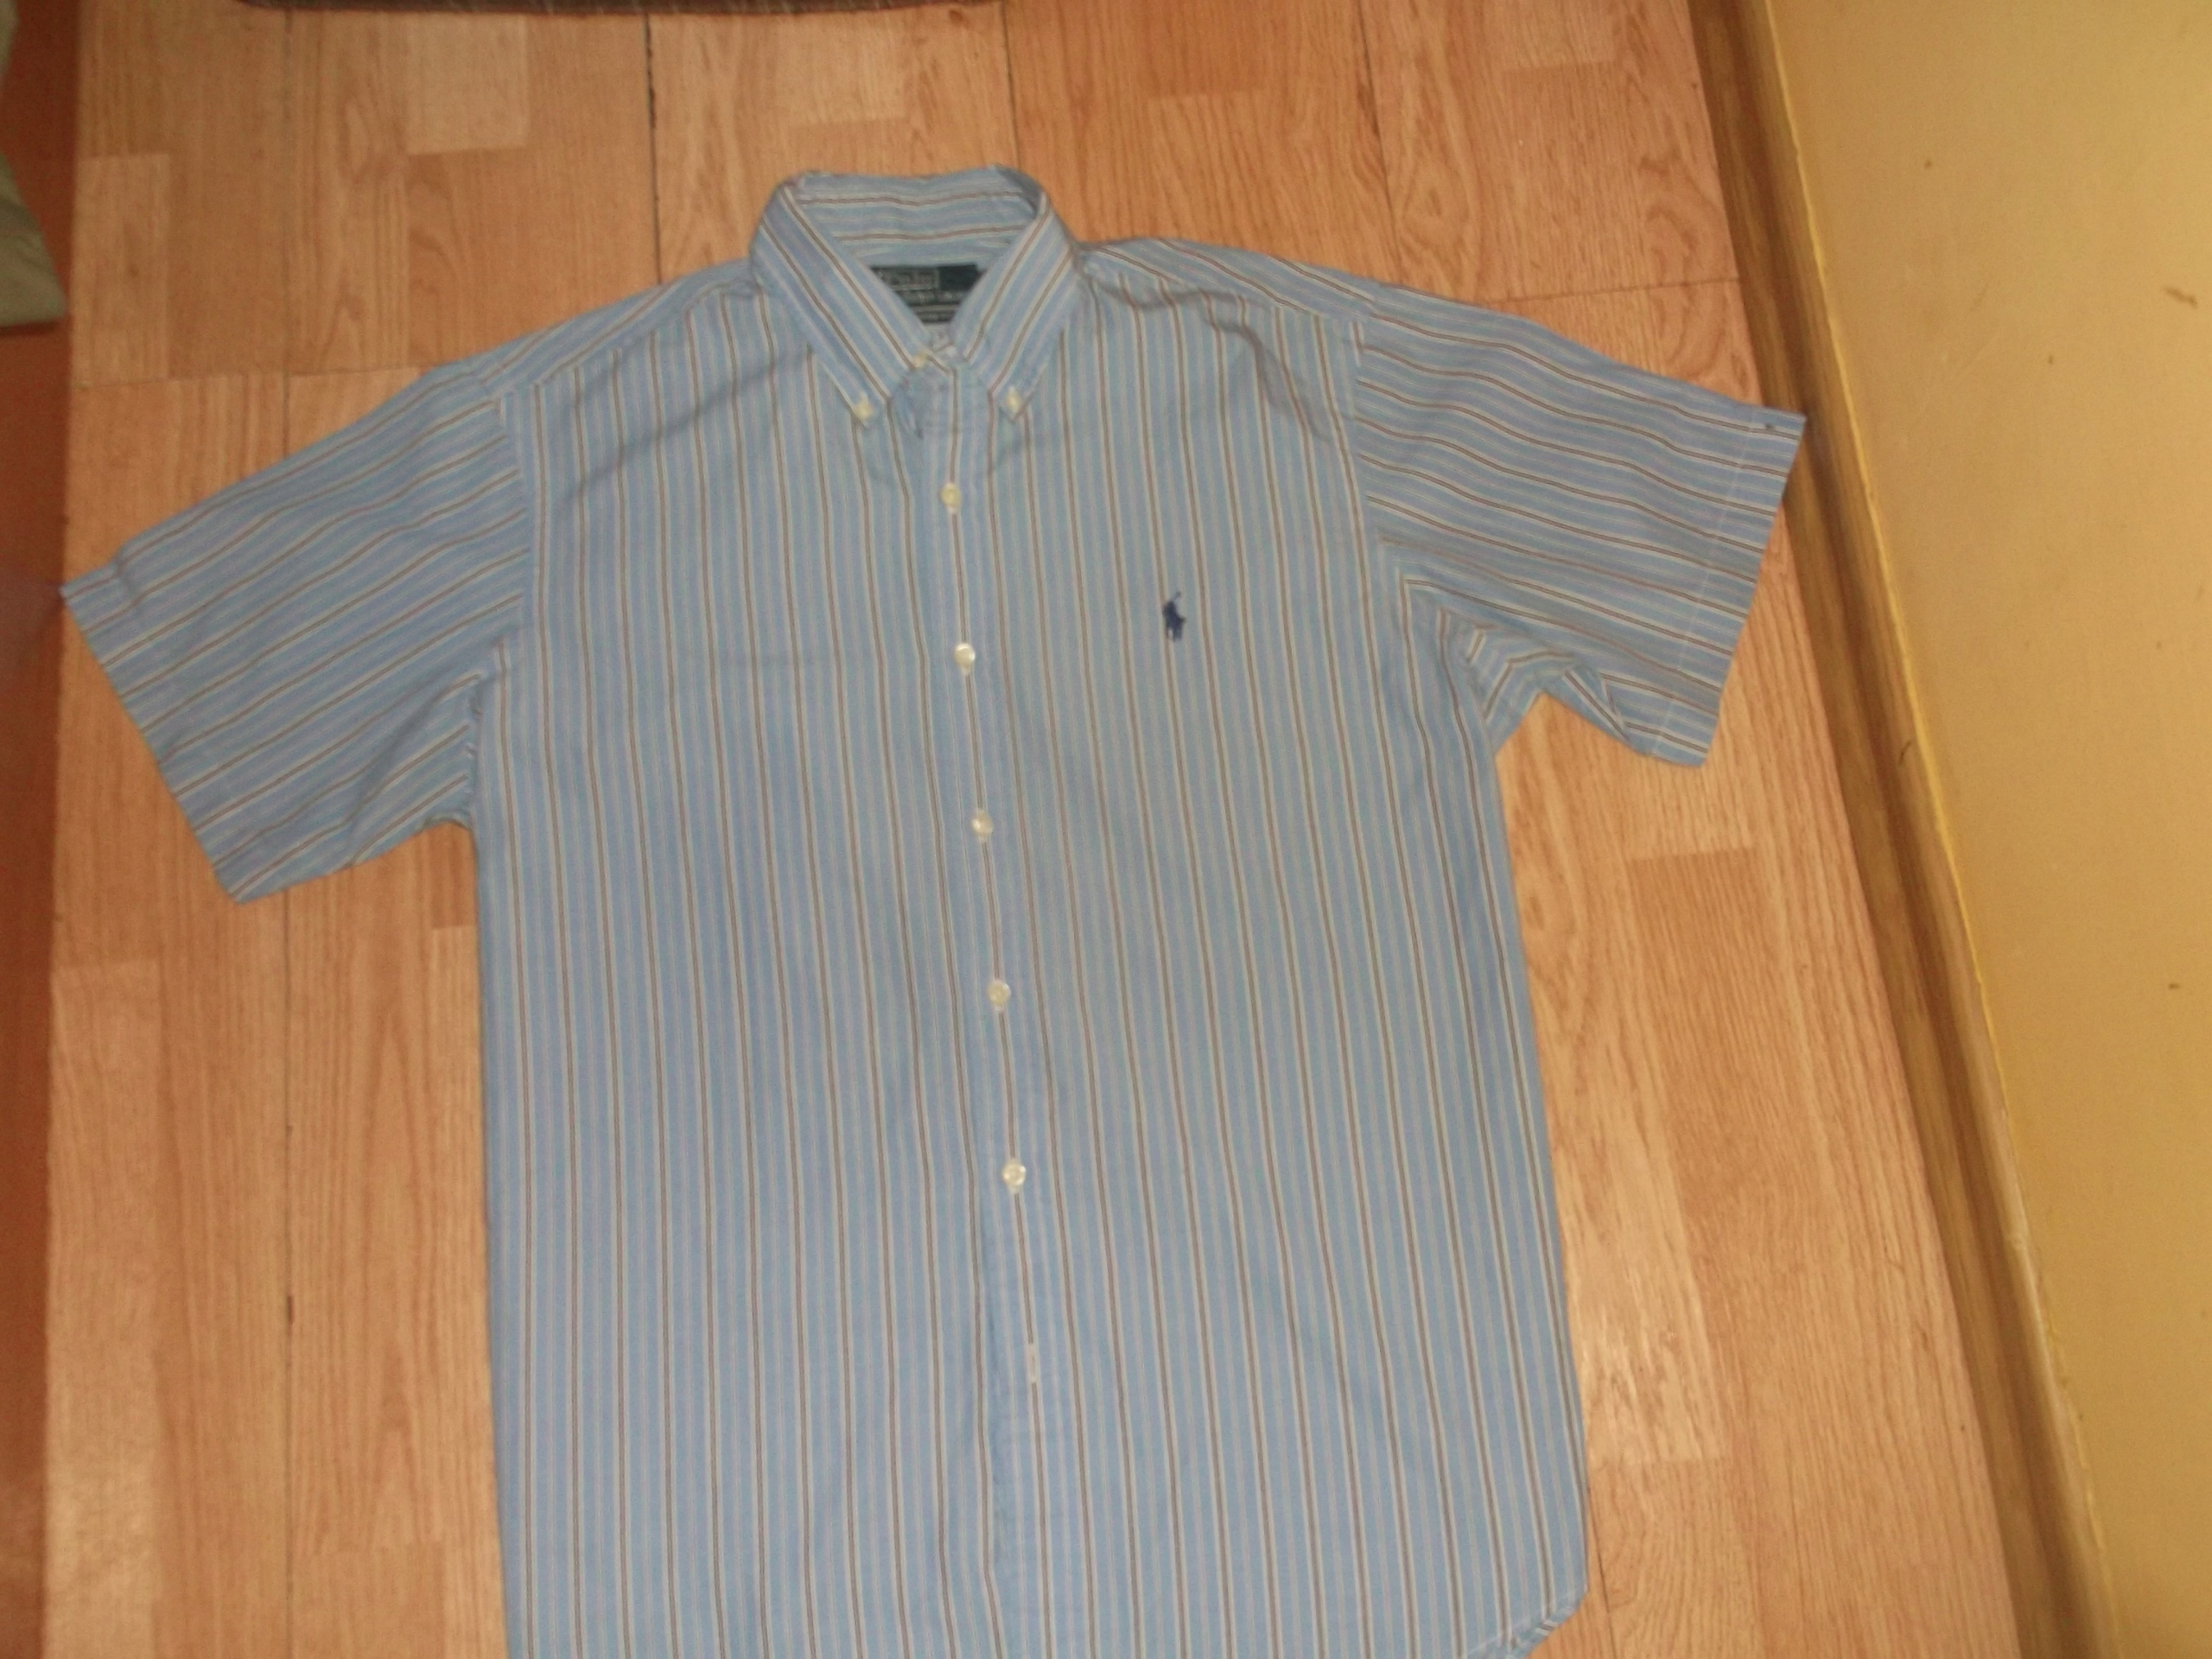 POLO BY RALPH LAUREN męska koszula w paski L/XL